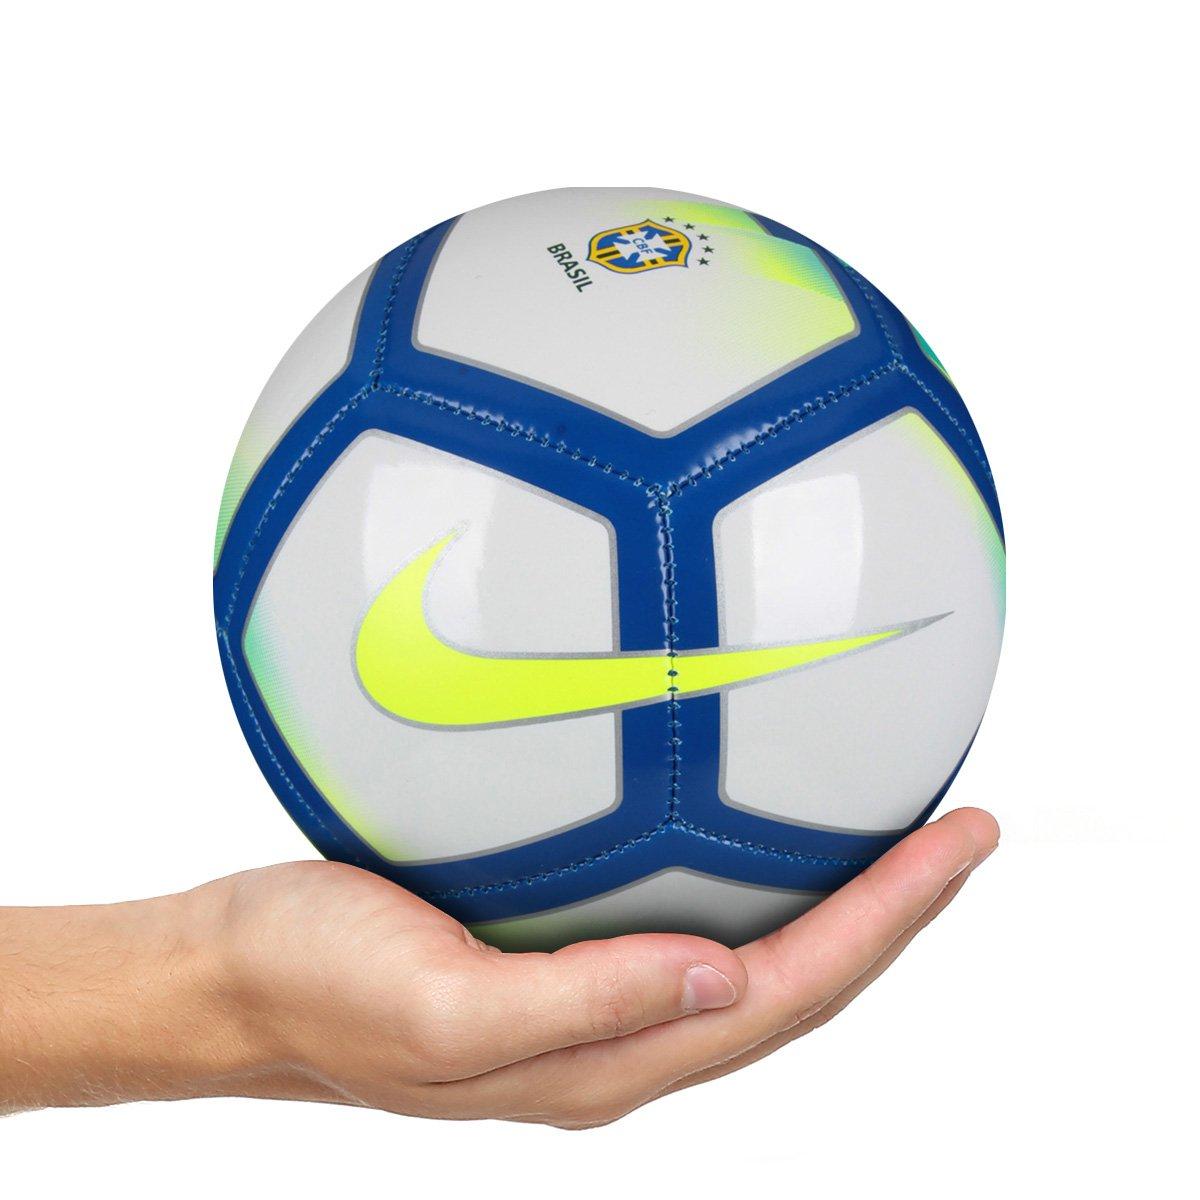 Mini Bola Nike CBF - Compre Agora  d46211a65dee3